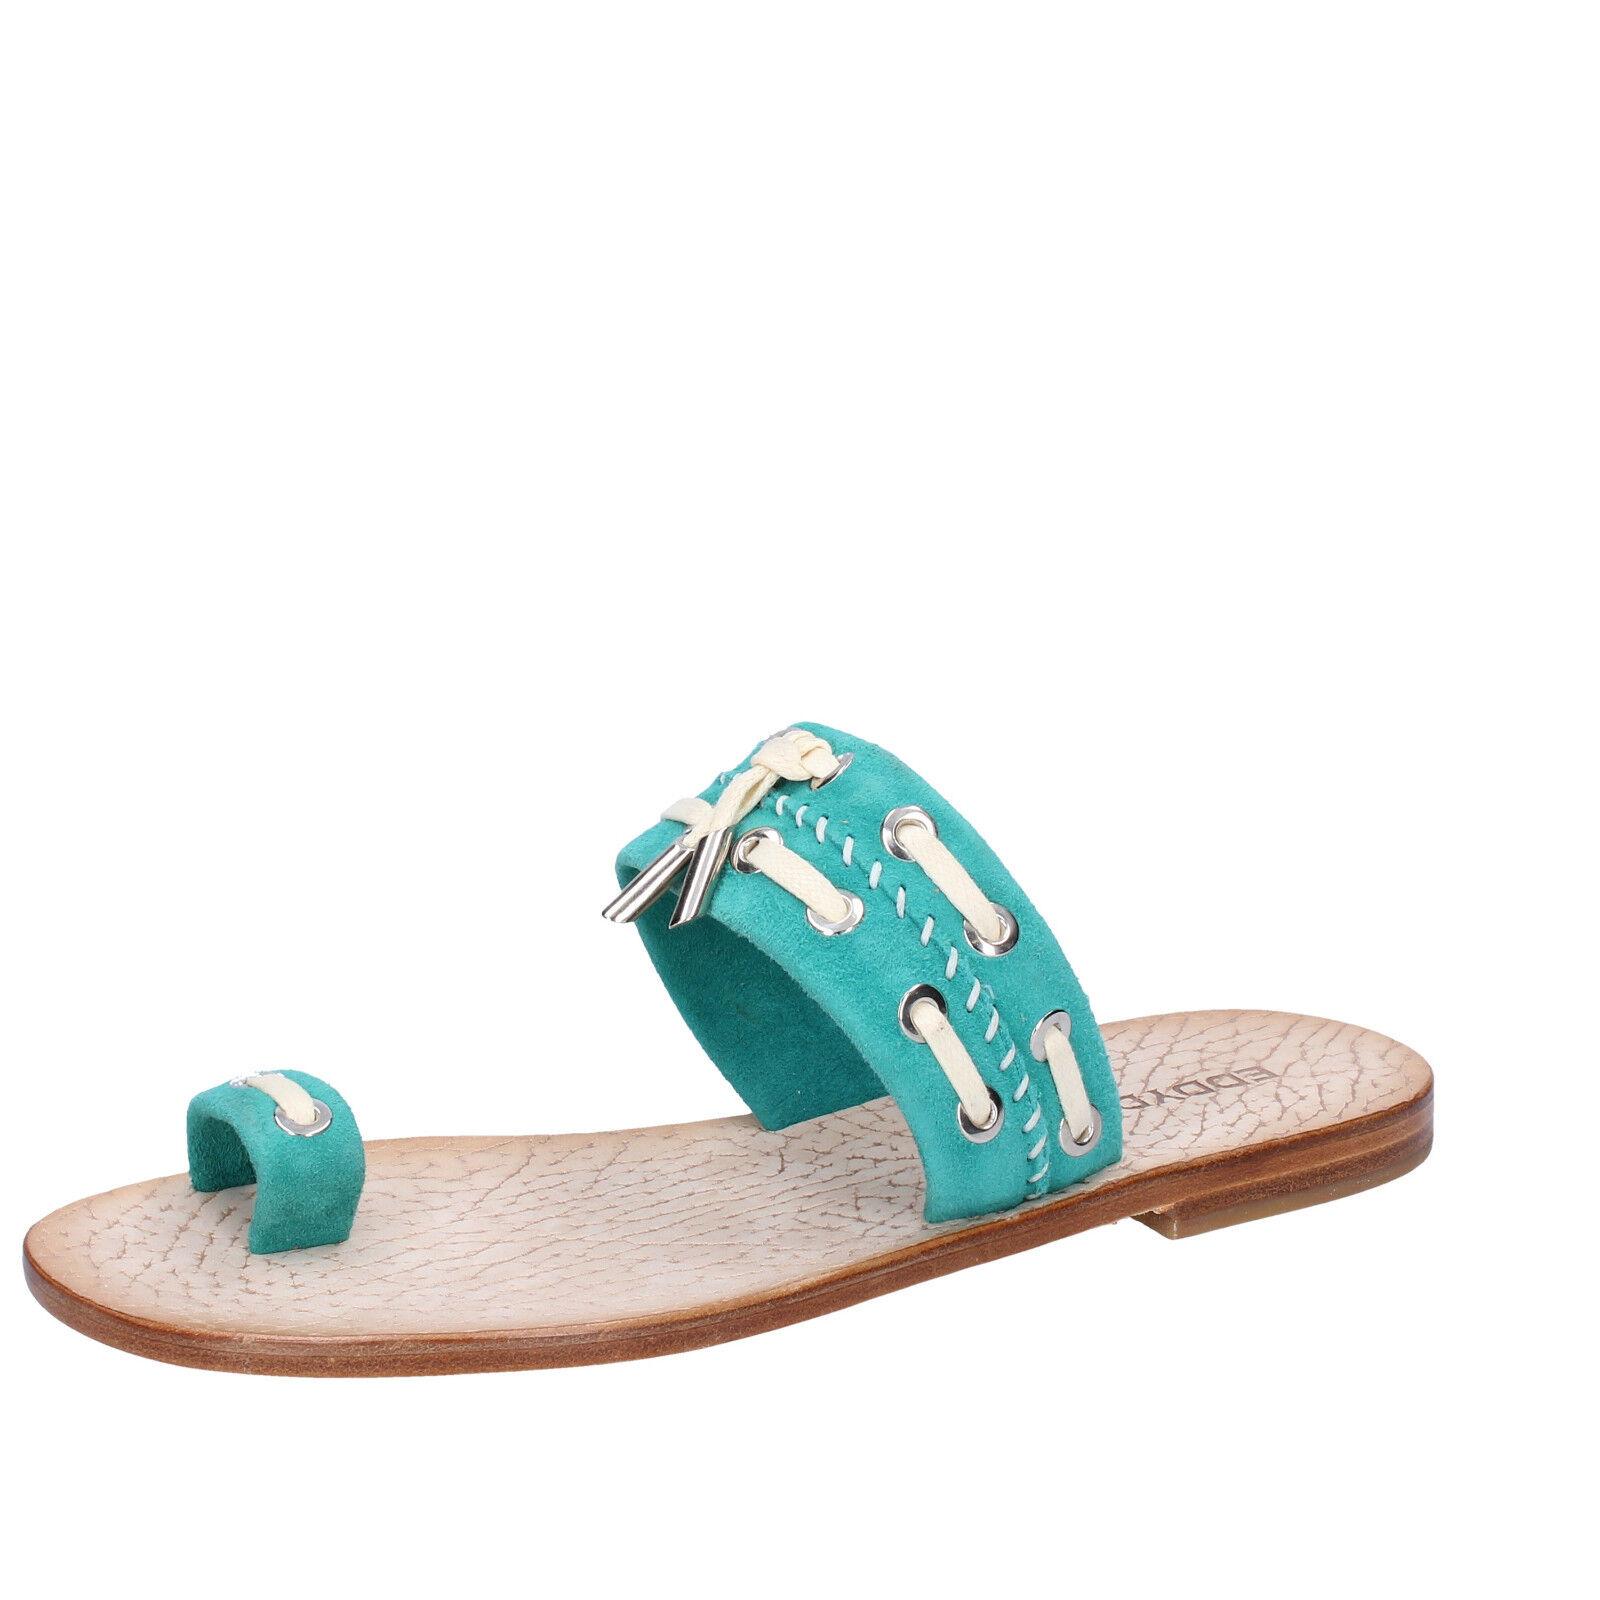 Scarpe donna EDDY DANIELE camoscio 37 EU sandali verde camoscio DANIELE AW307-37 894f79